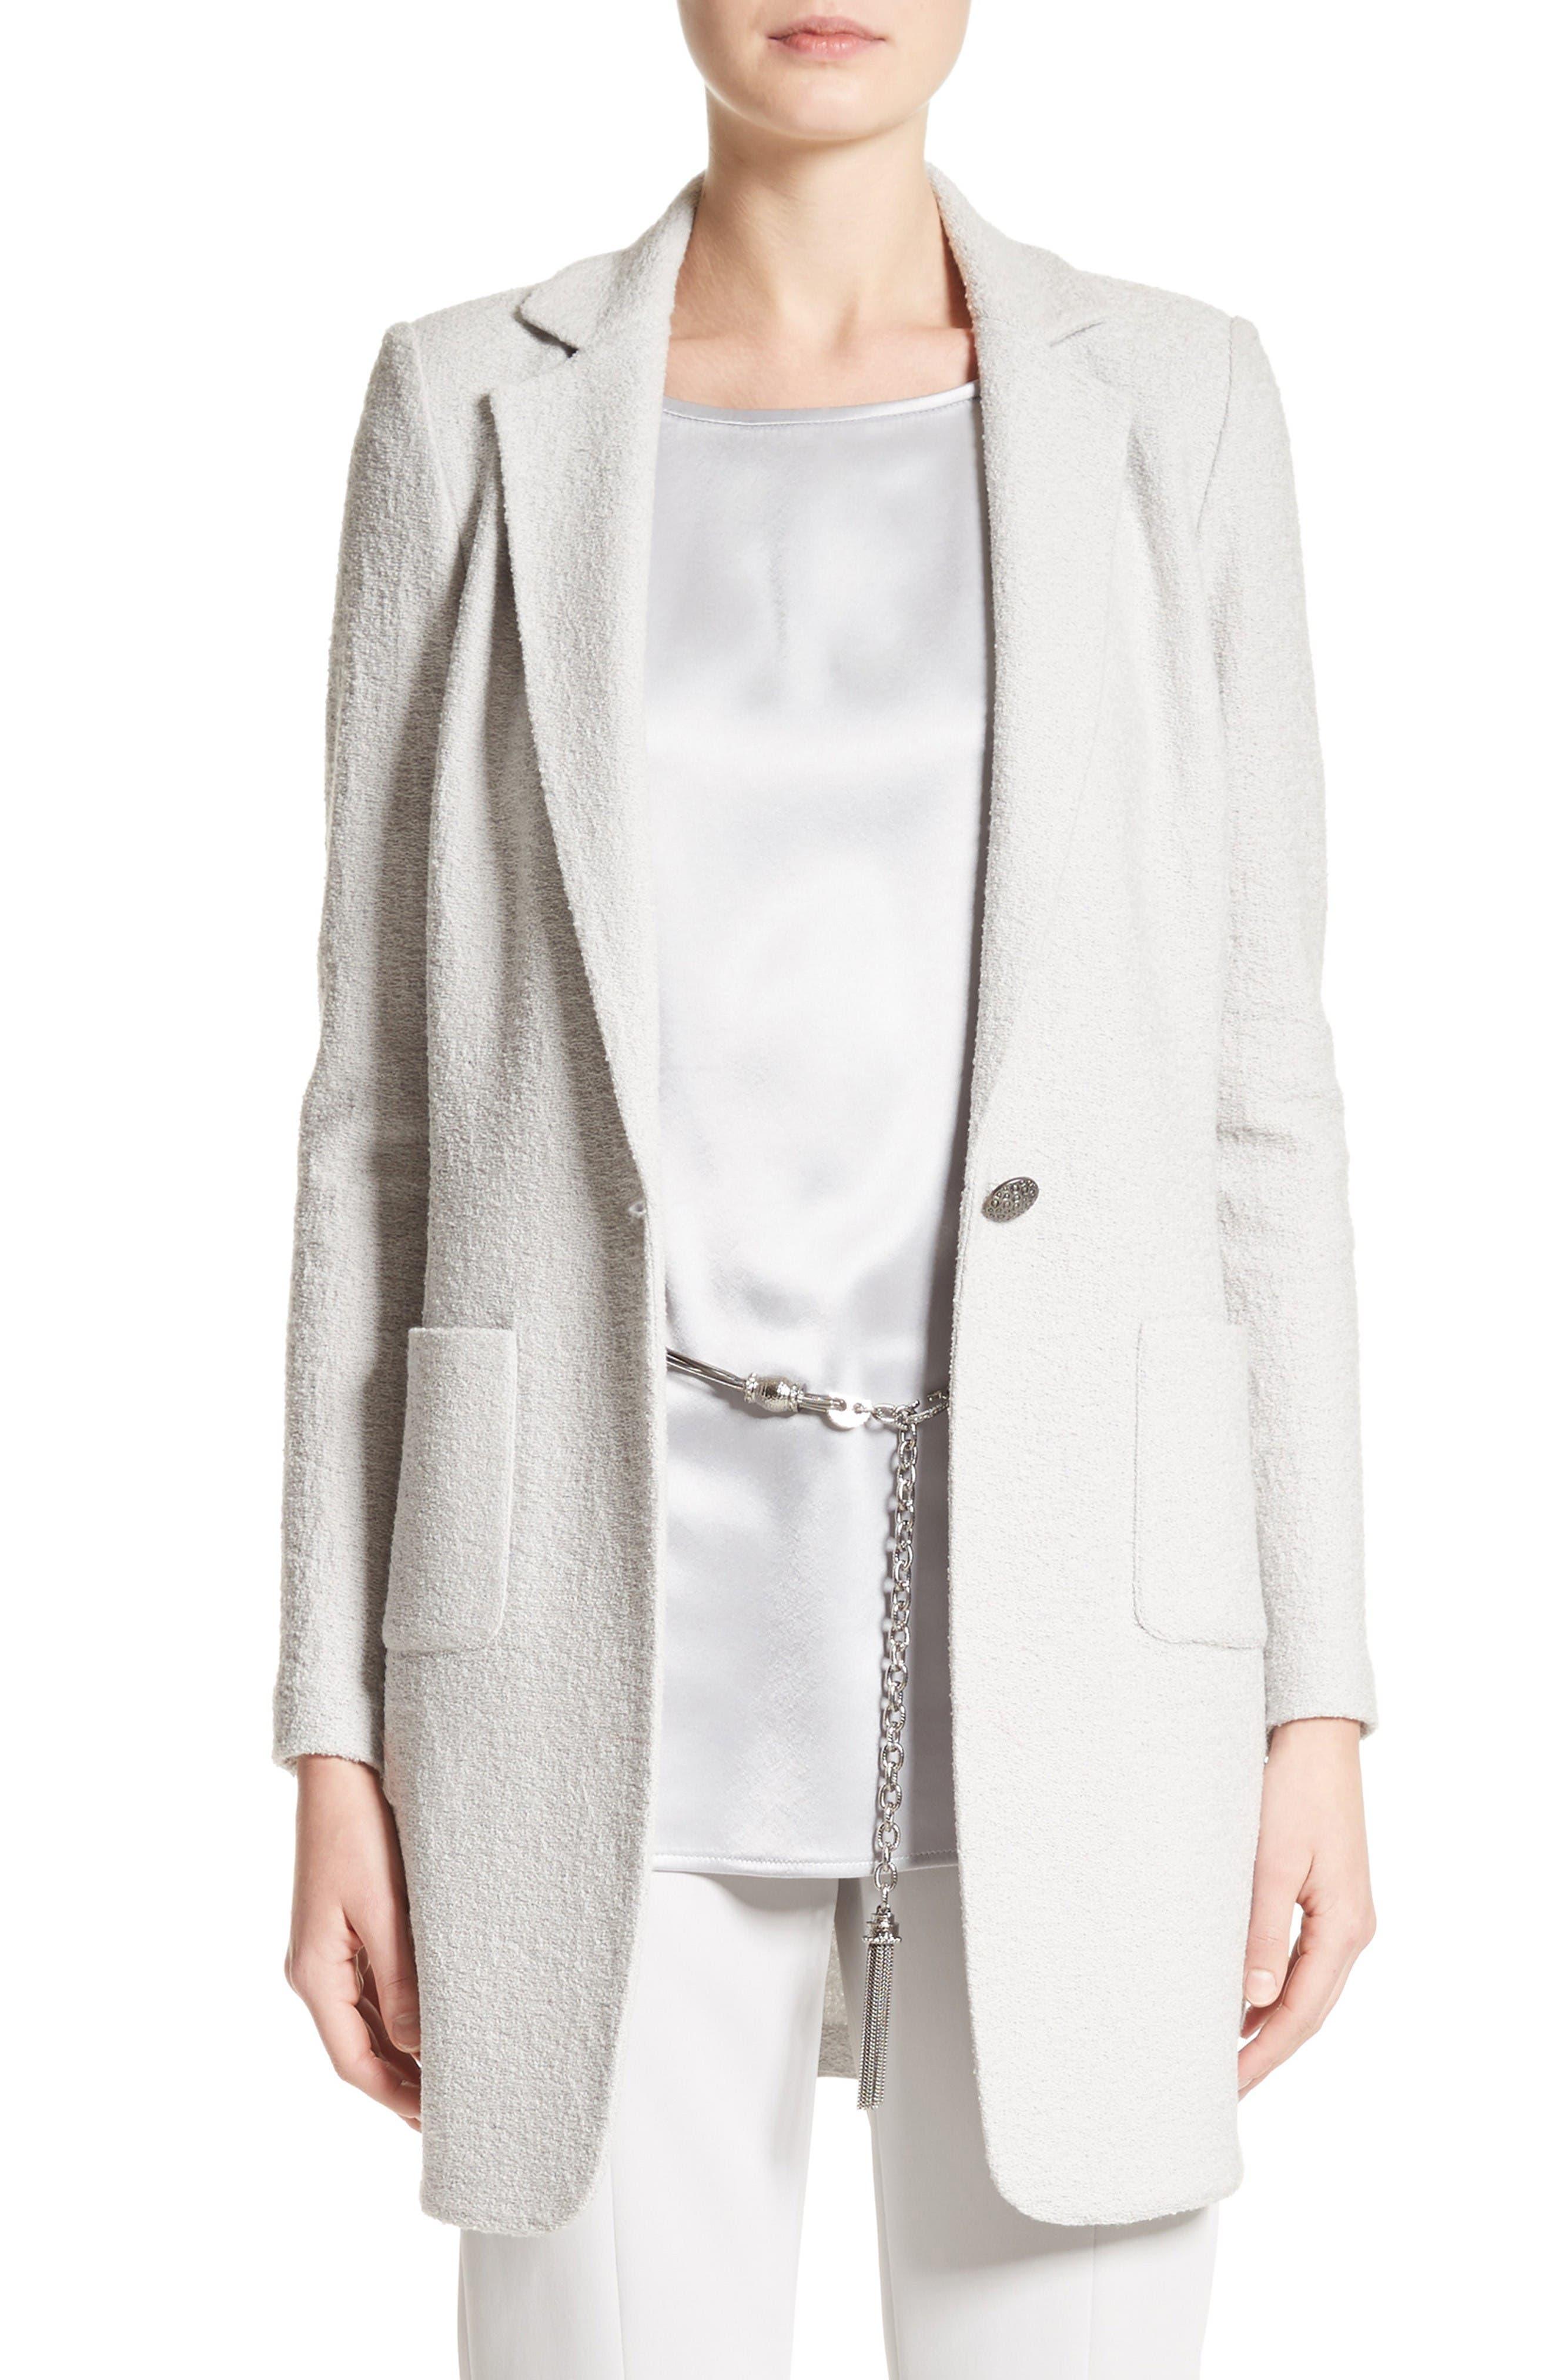 Main Image - St. John Collection Clair Knit Jacket